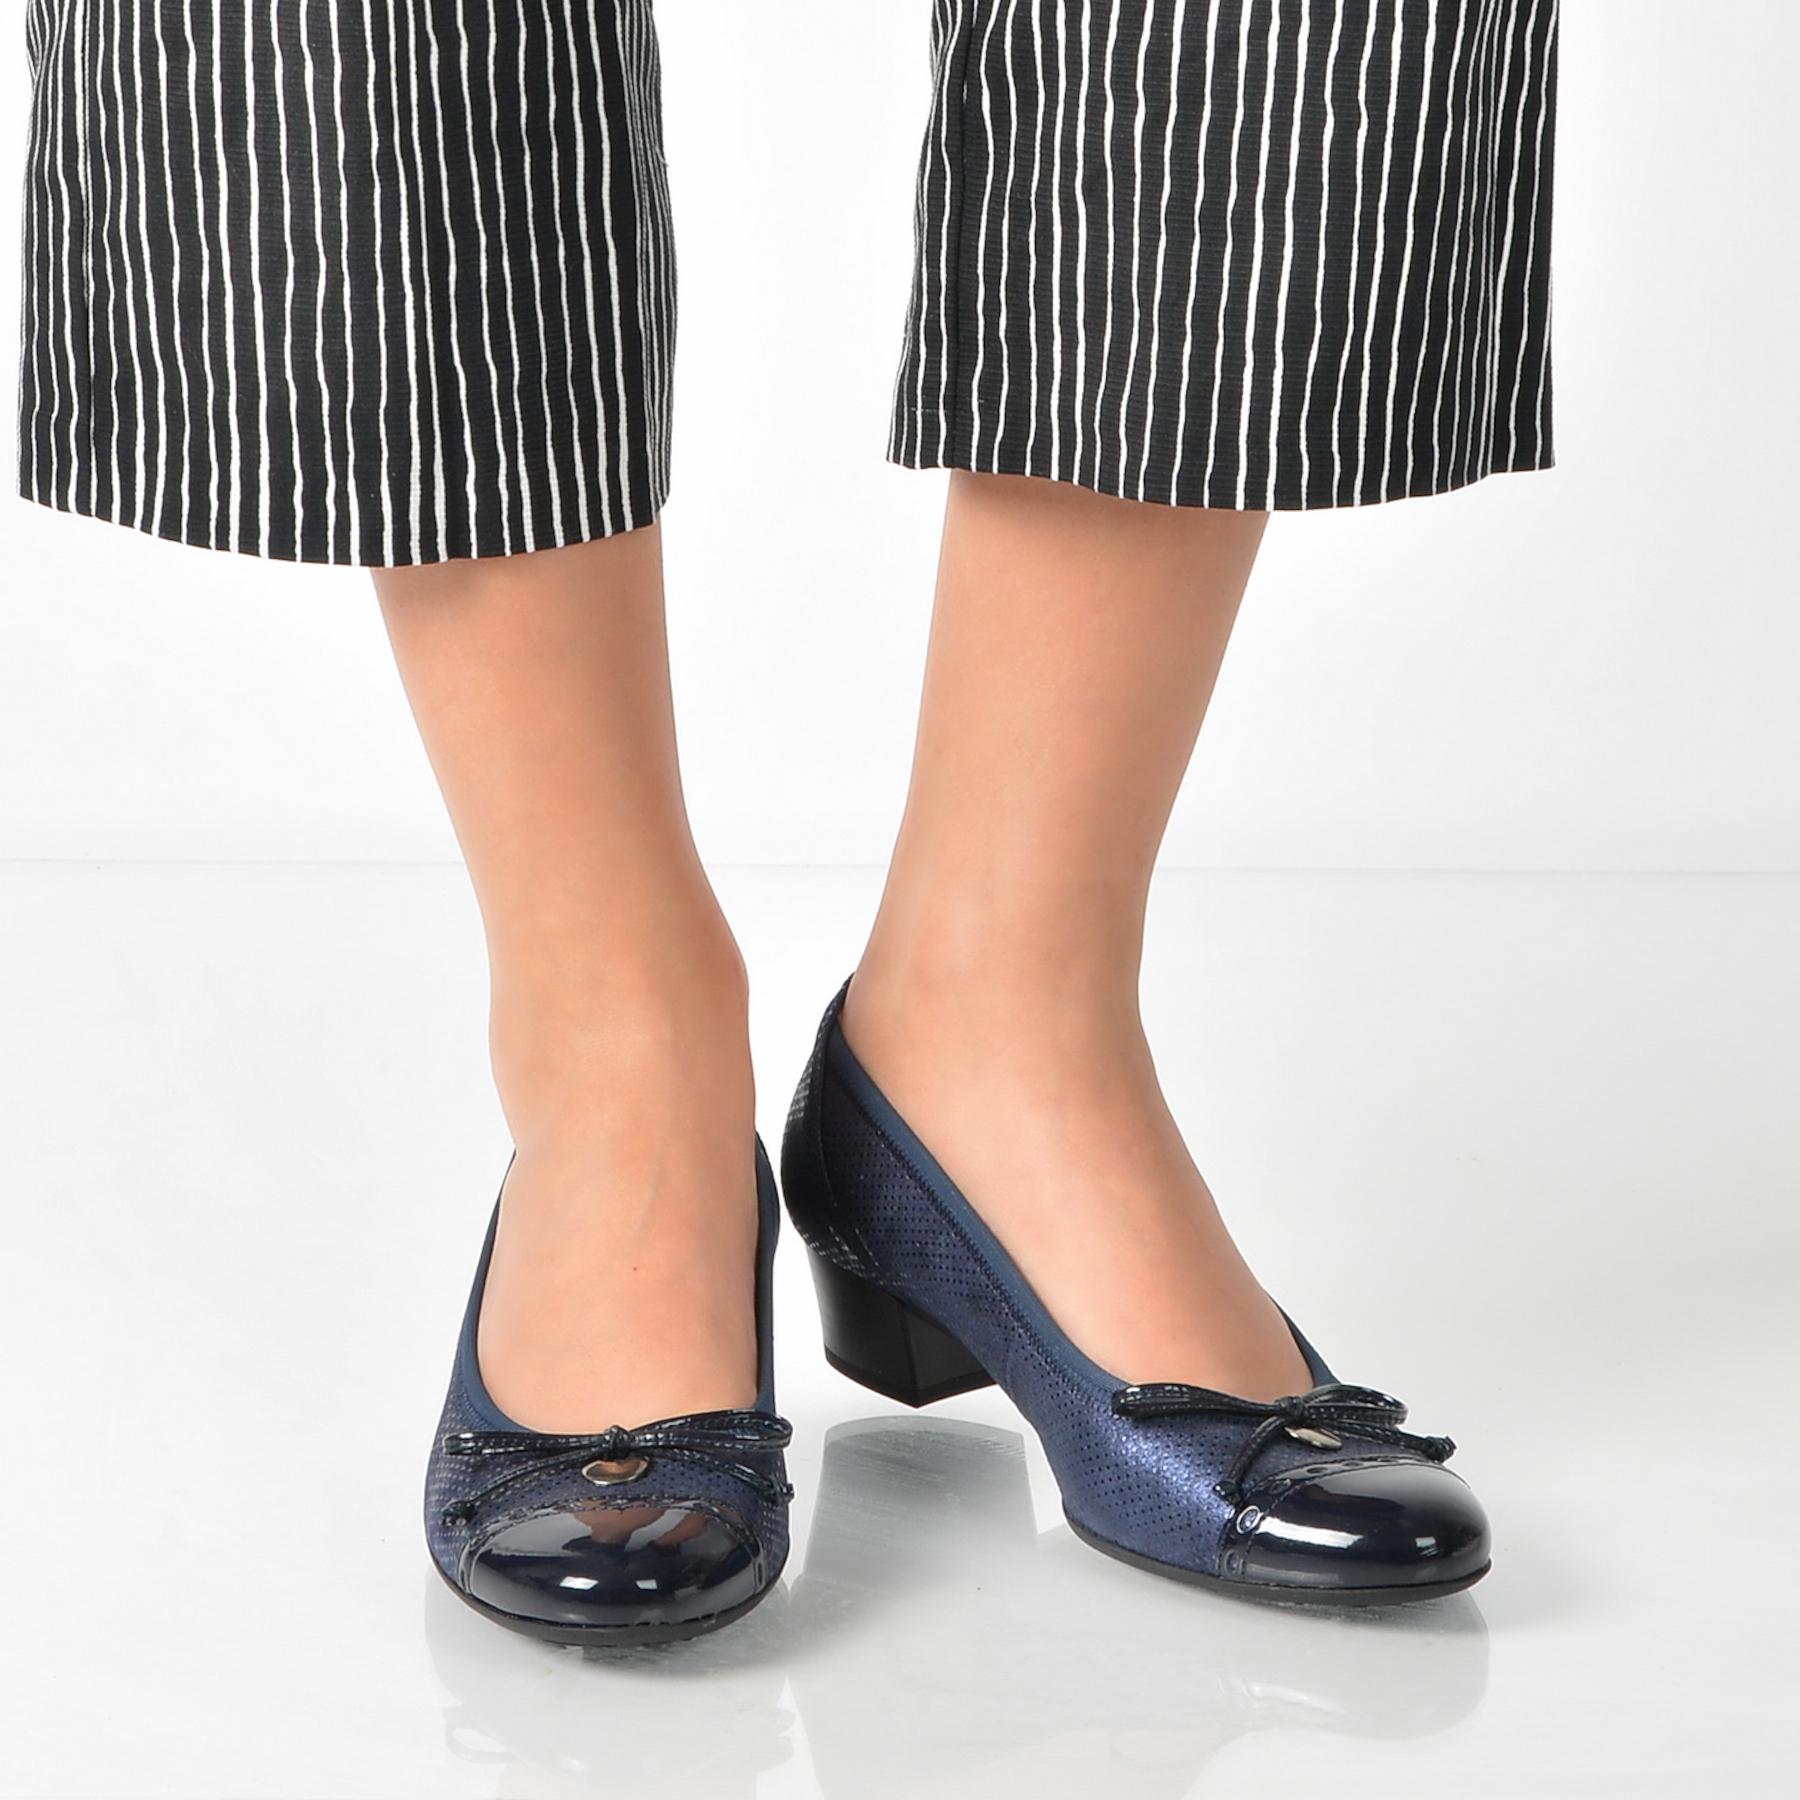 Pantofi Gabor Bleumarin, 82203, Din Piele Intoarsa